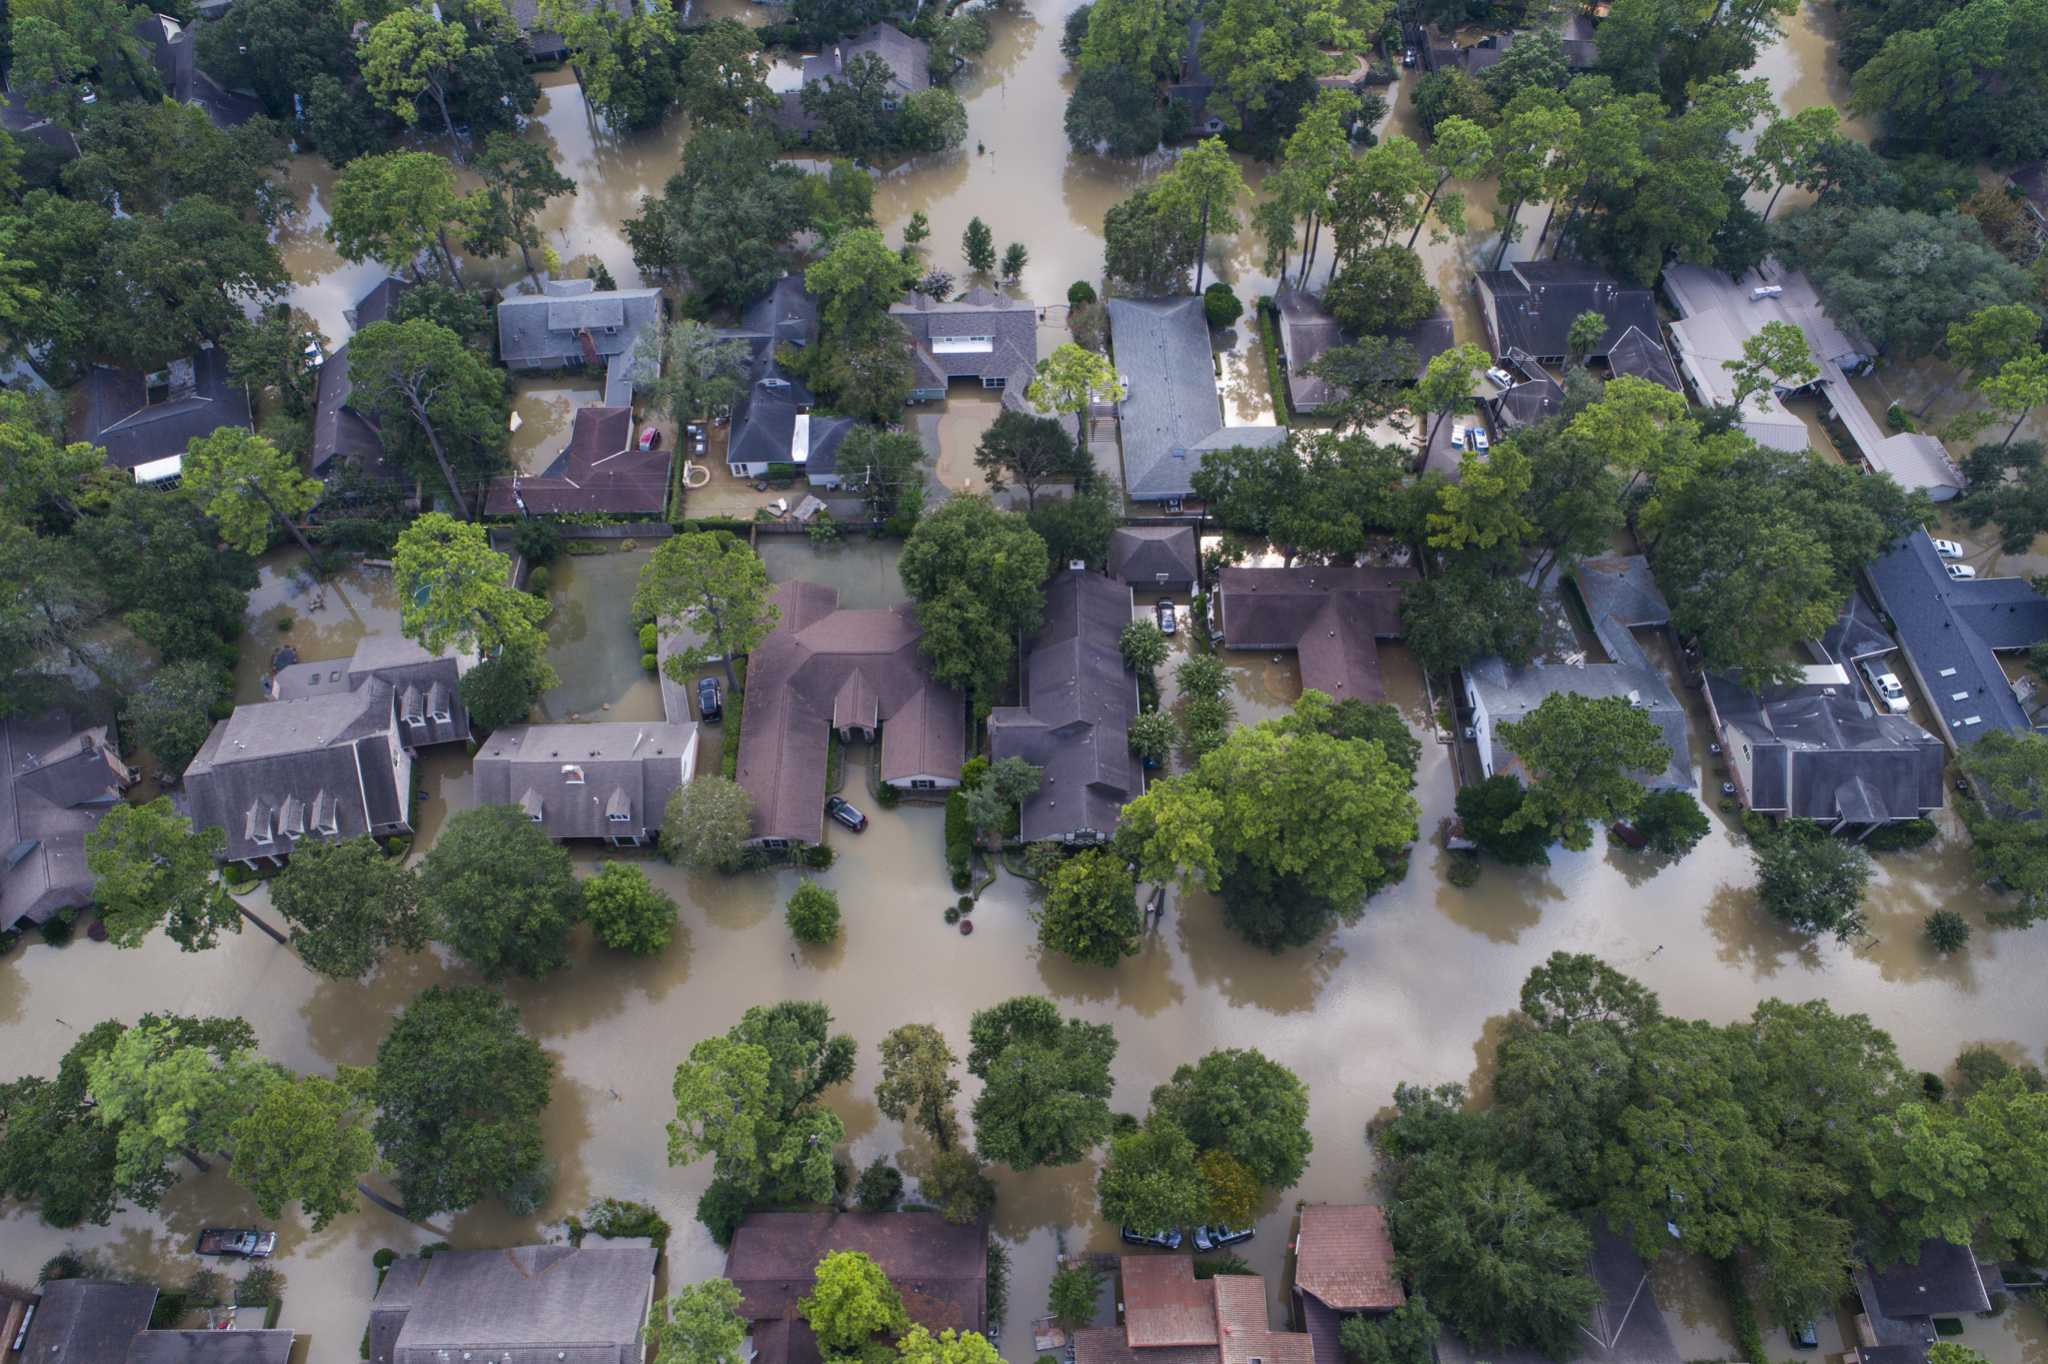 Abbott criticizes Houston's Harvey response